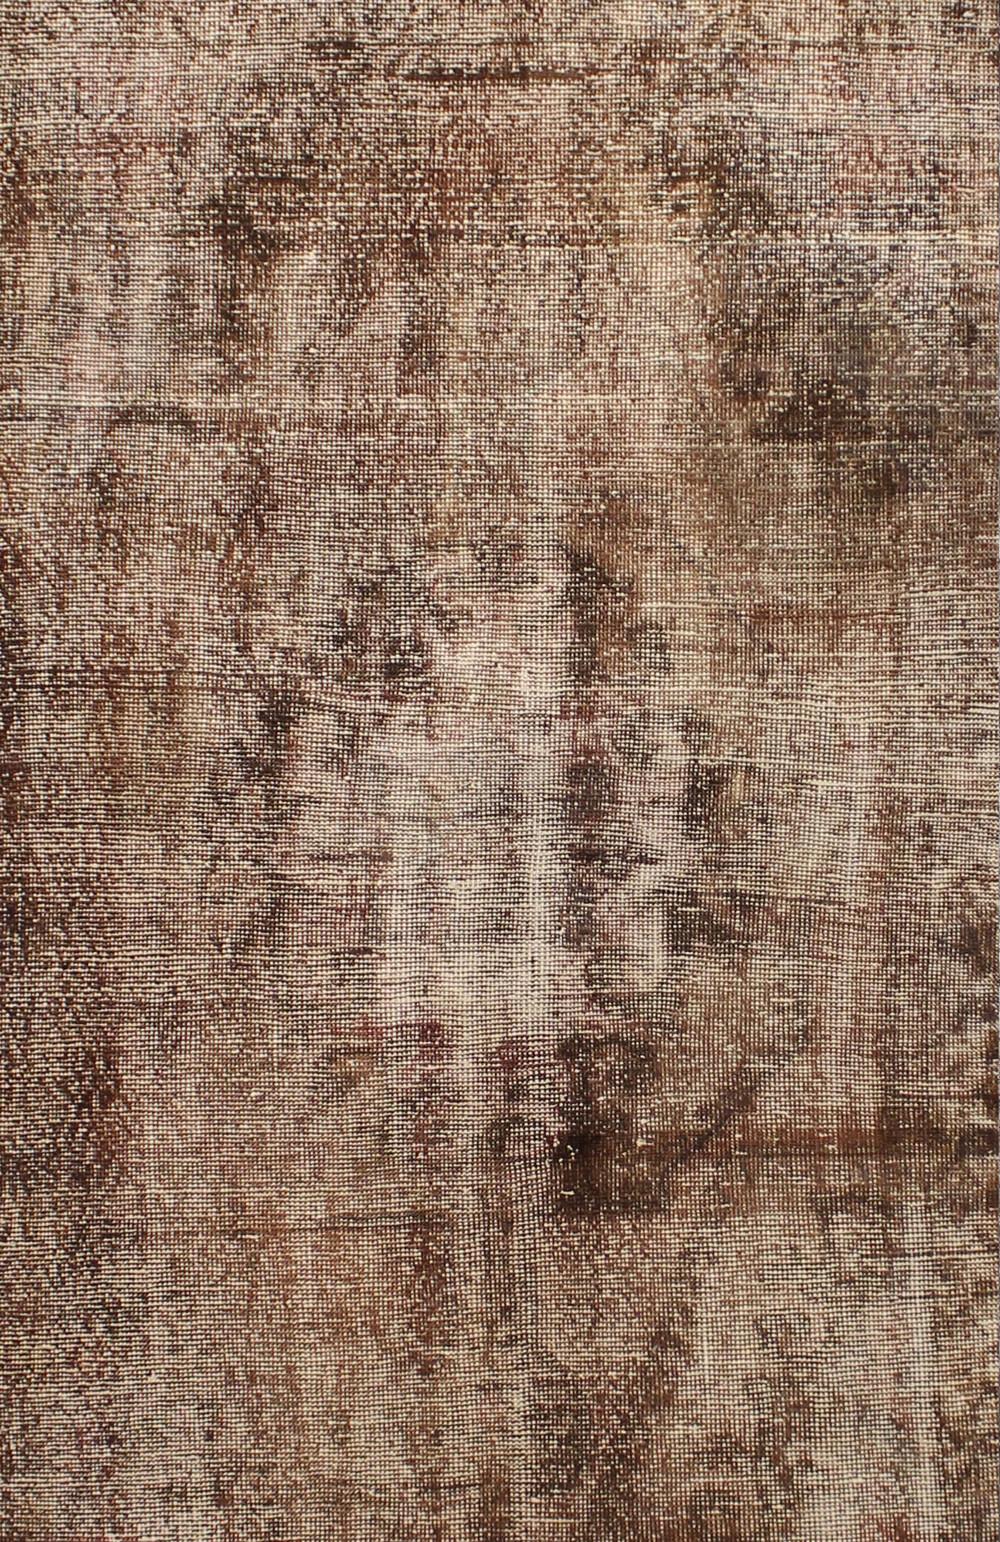 Copy of BROWN